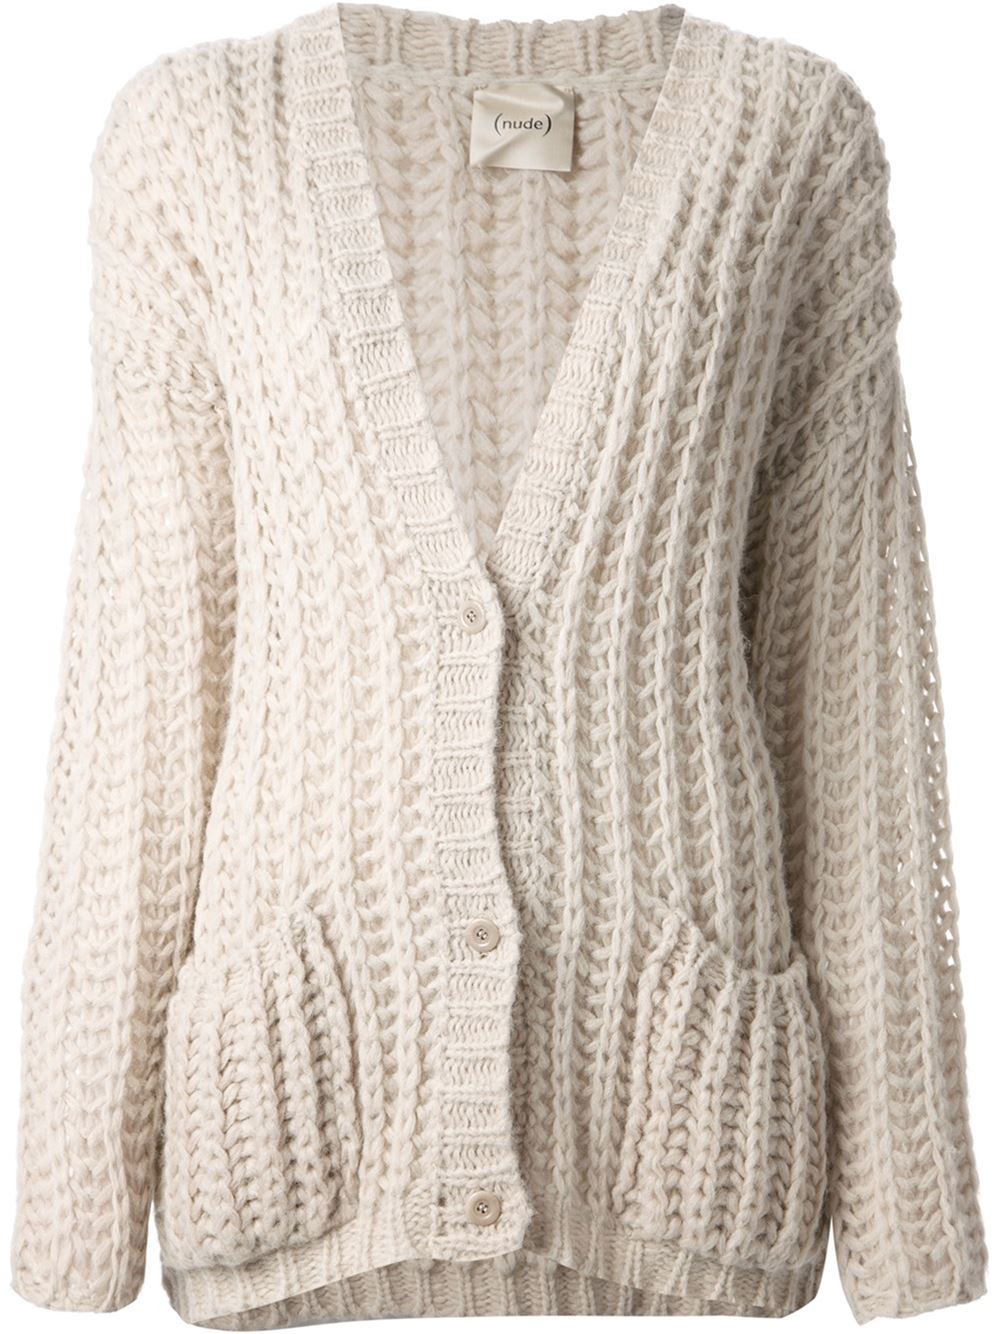 chunky knit cardigans gallery DPSPKYD